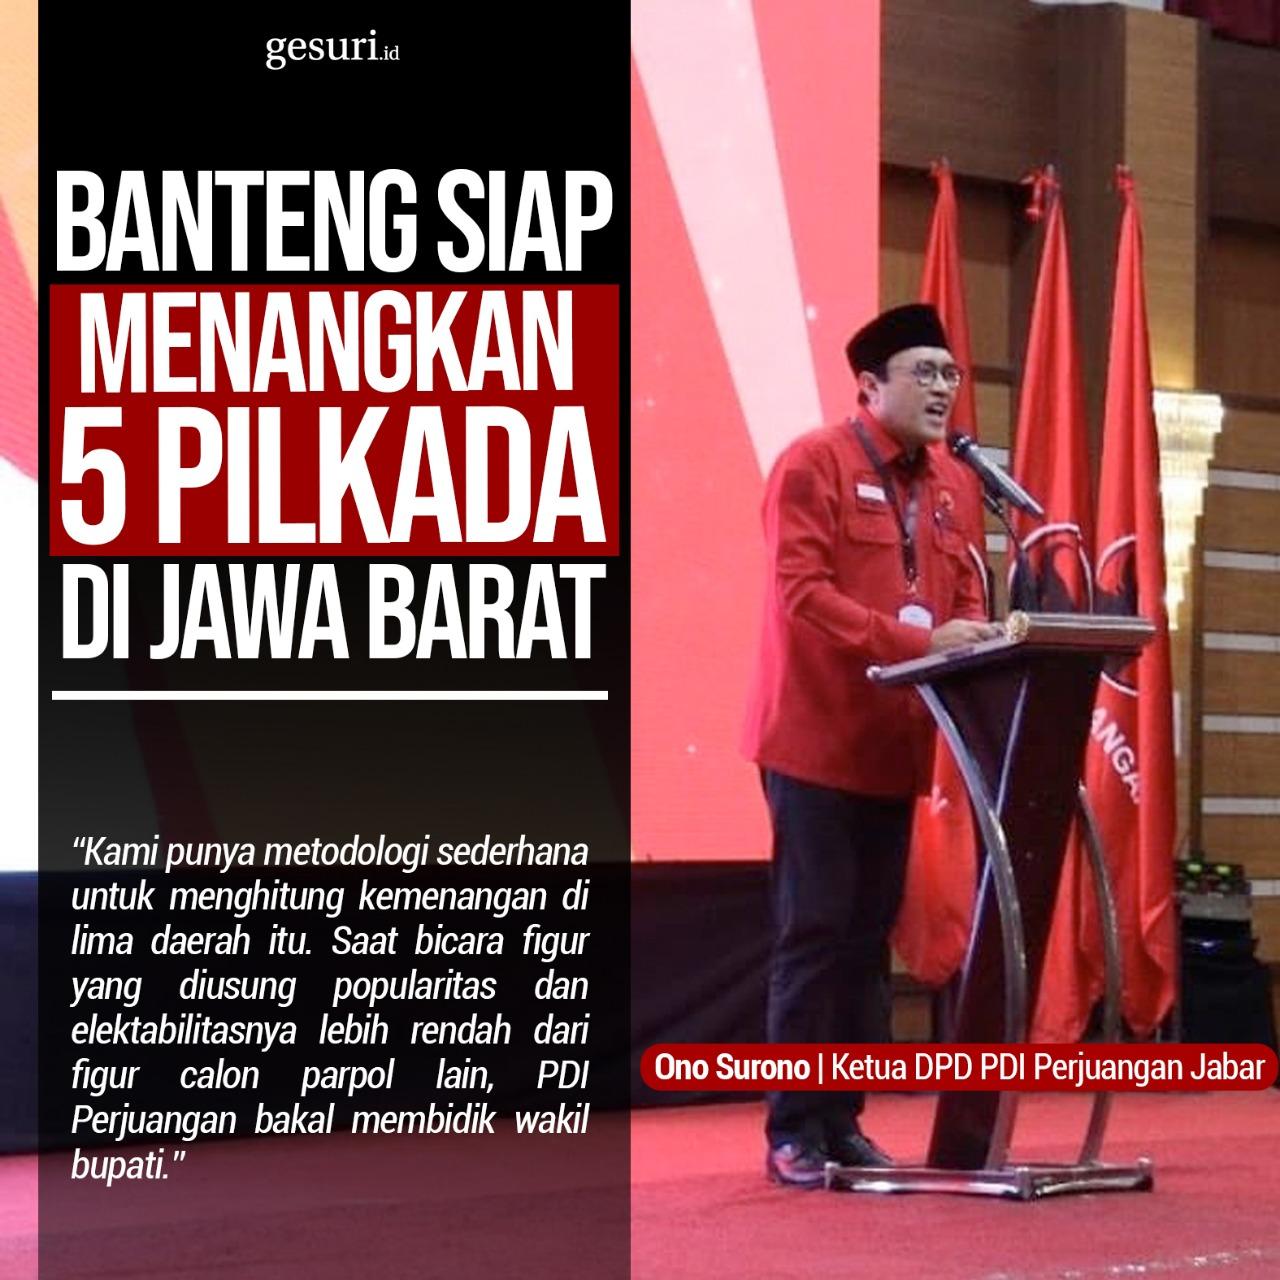 Banteng Menangkan 5 Pilkada di Jawa Barat